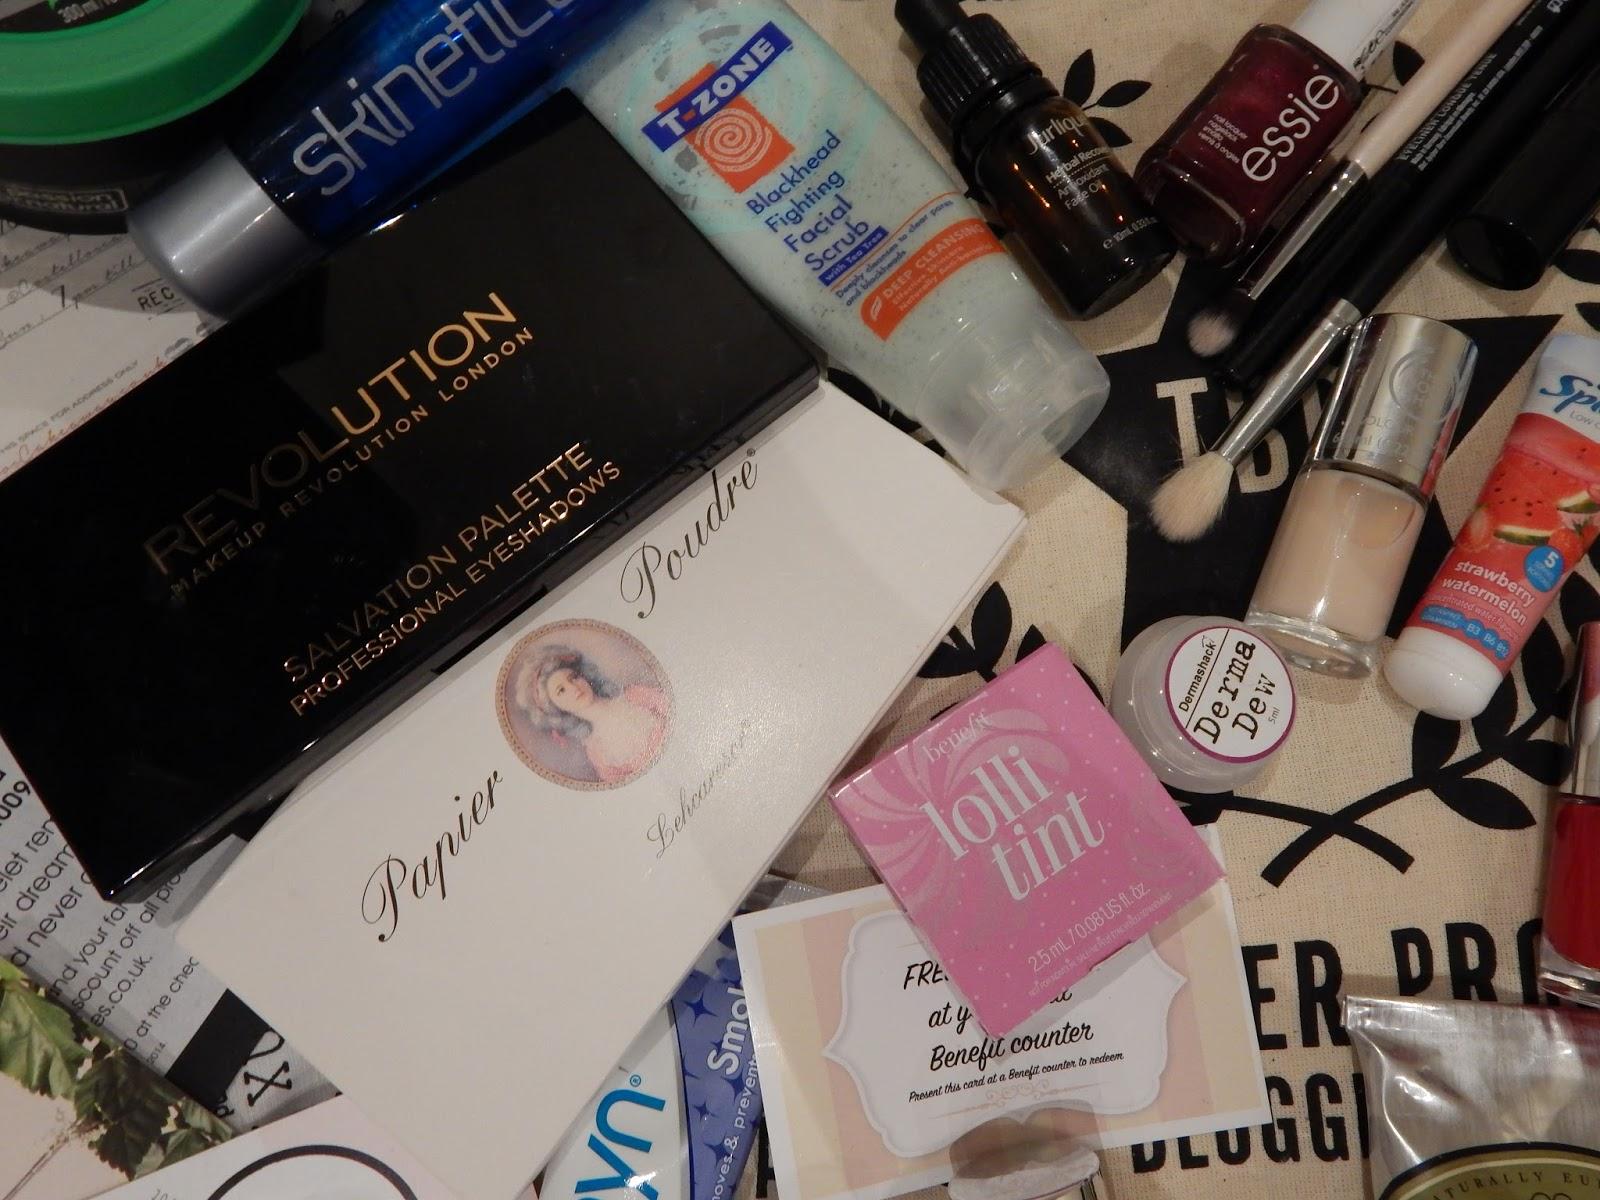 #SheffieldBBloggers Goodie Bag & Raffle Prizes!